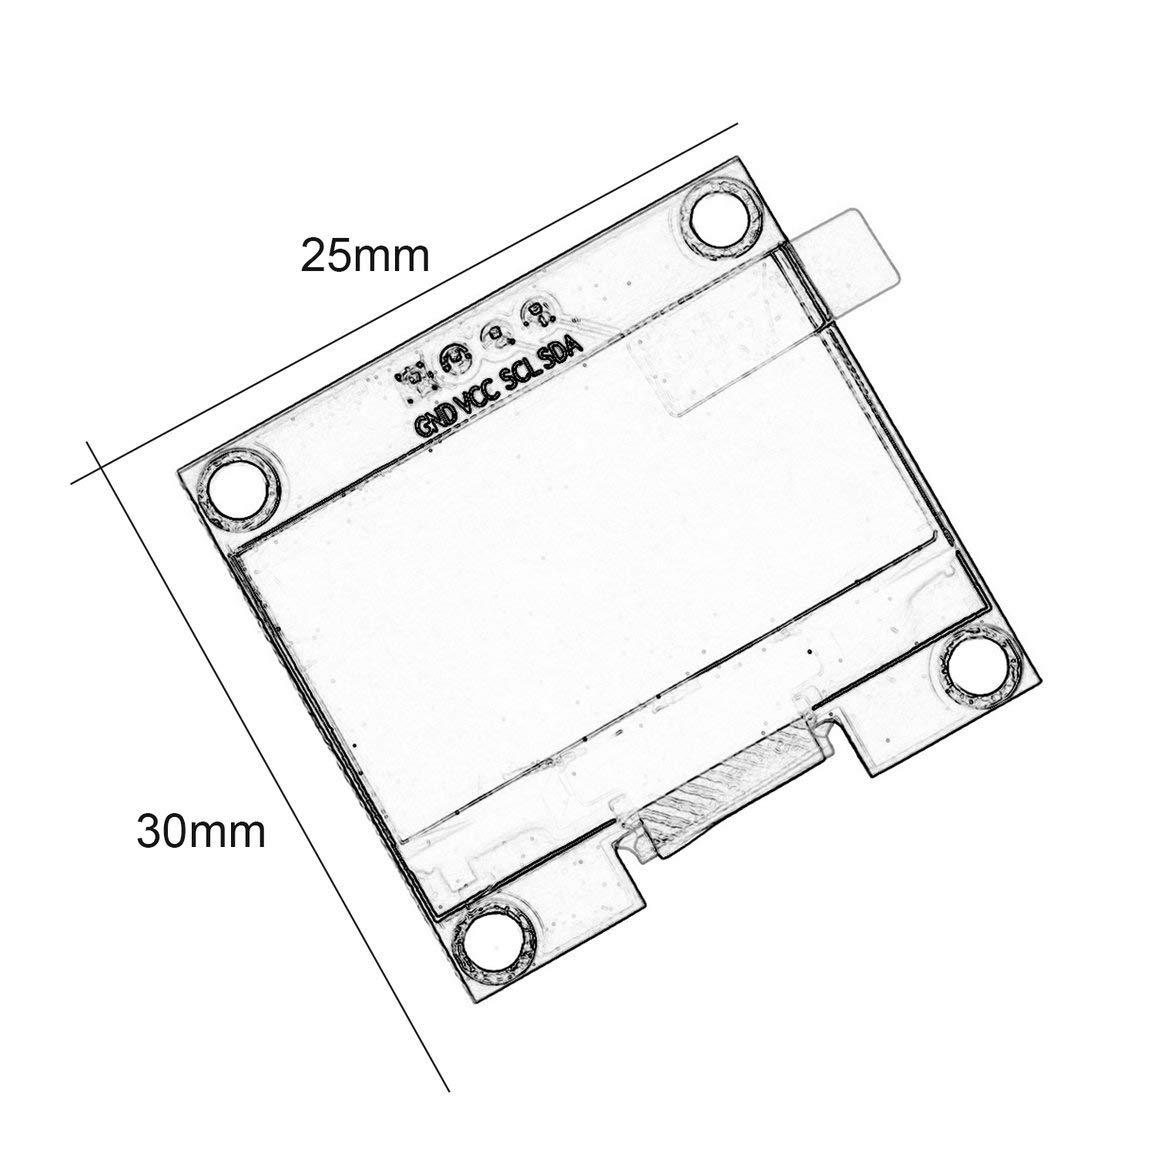 1 3 Zoll 4 Pin I2c Iic Serien 128x64 Oled Lcd Led Sh1106 Wiringpi Spi Clock Produktbeschreibungen